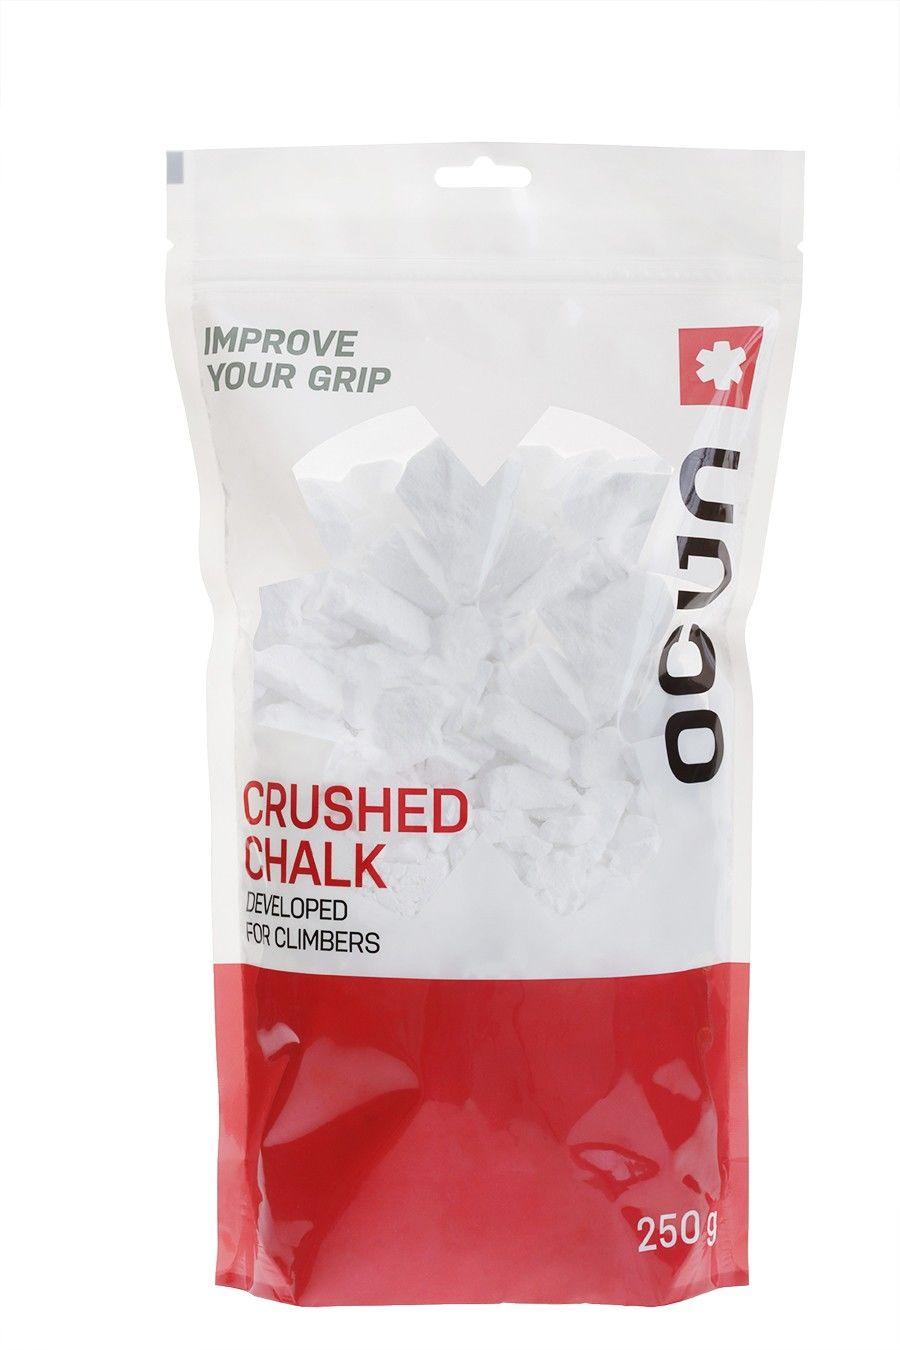 Ocun Crushed Chalk 250g Weiß, Klettern, One Size